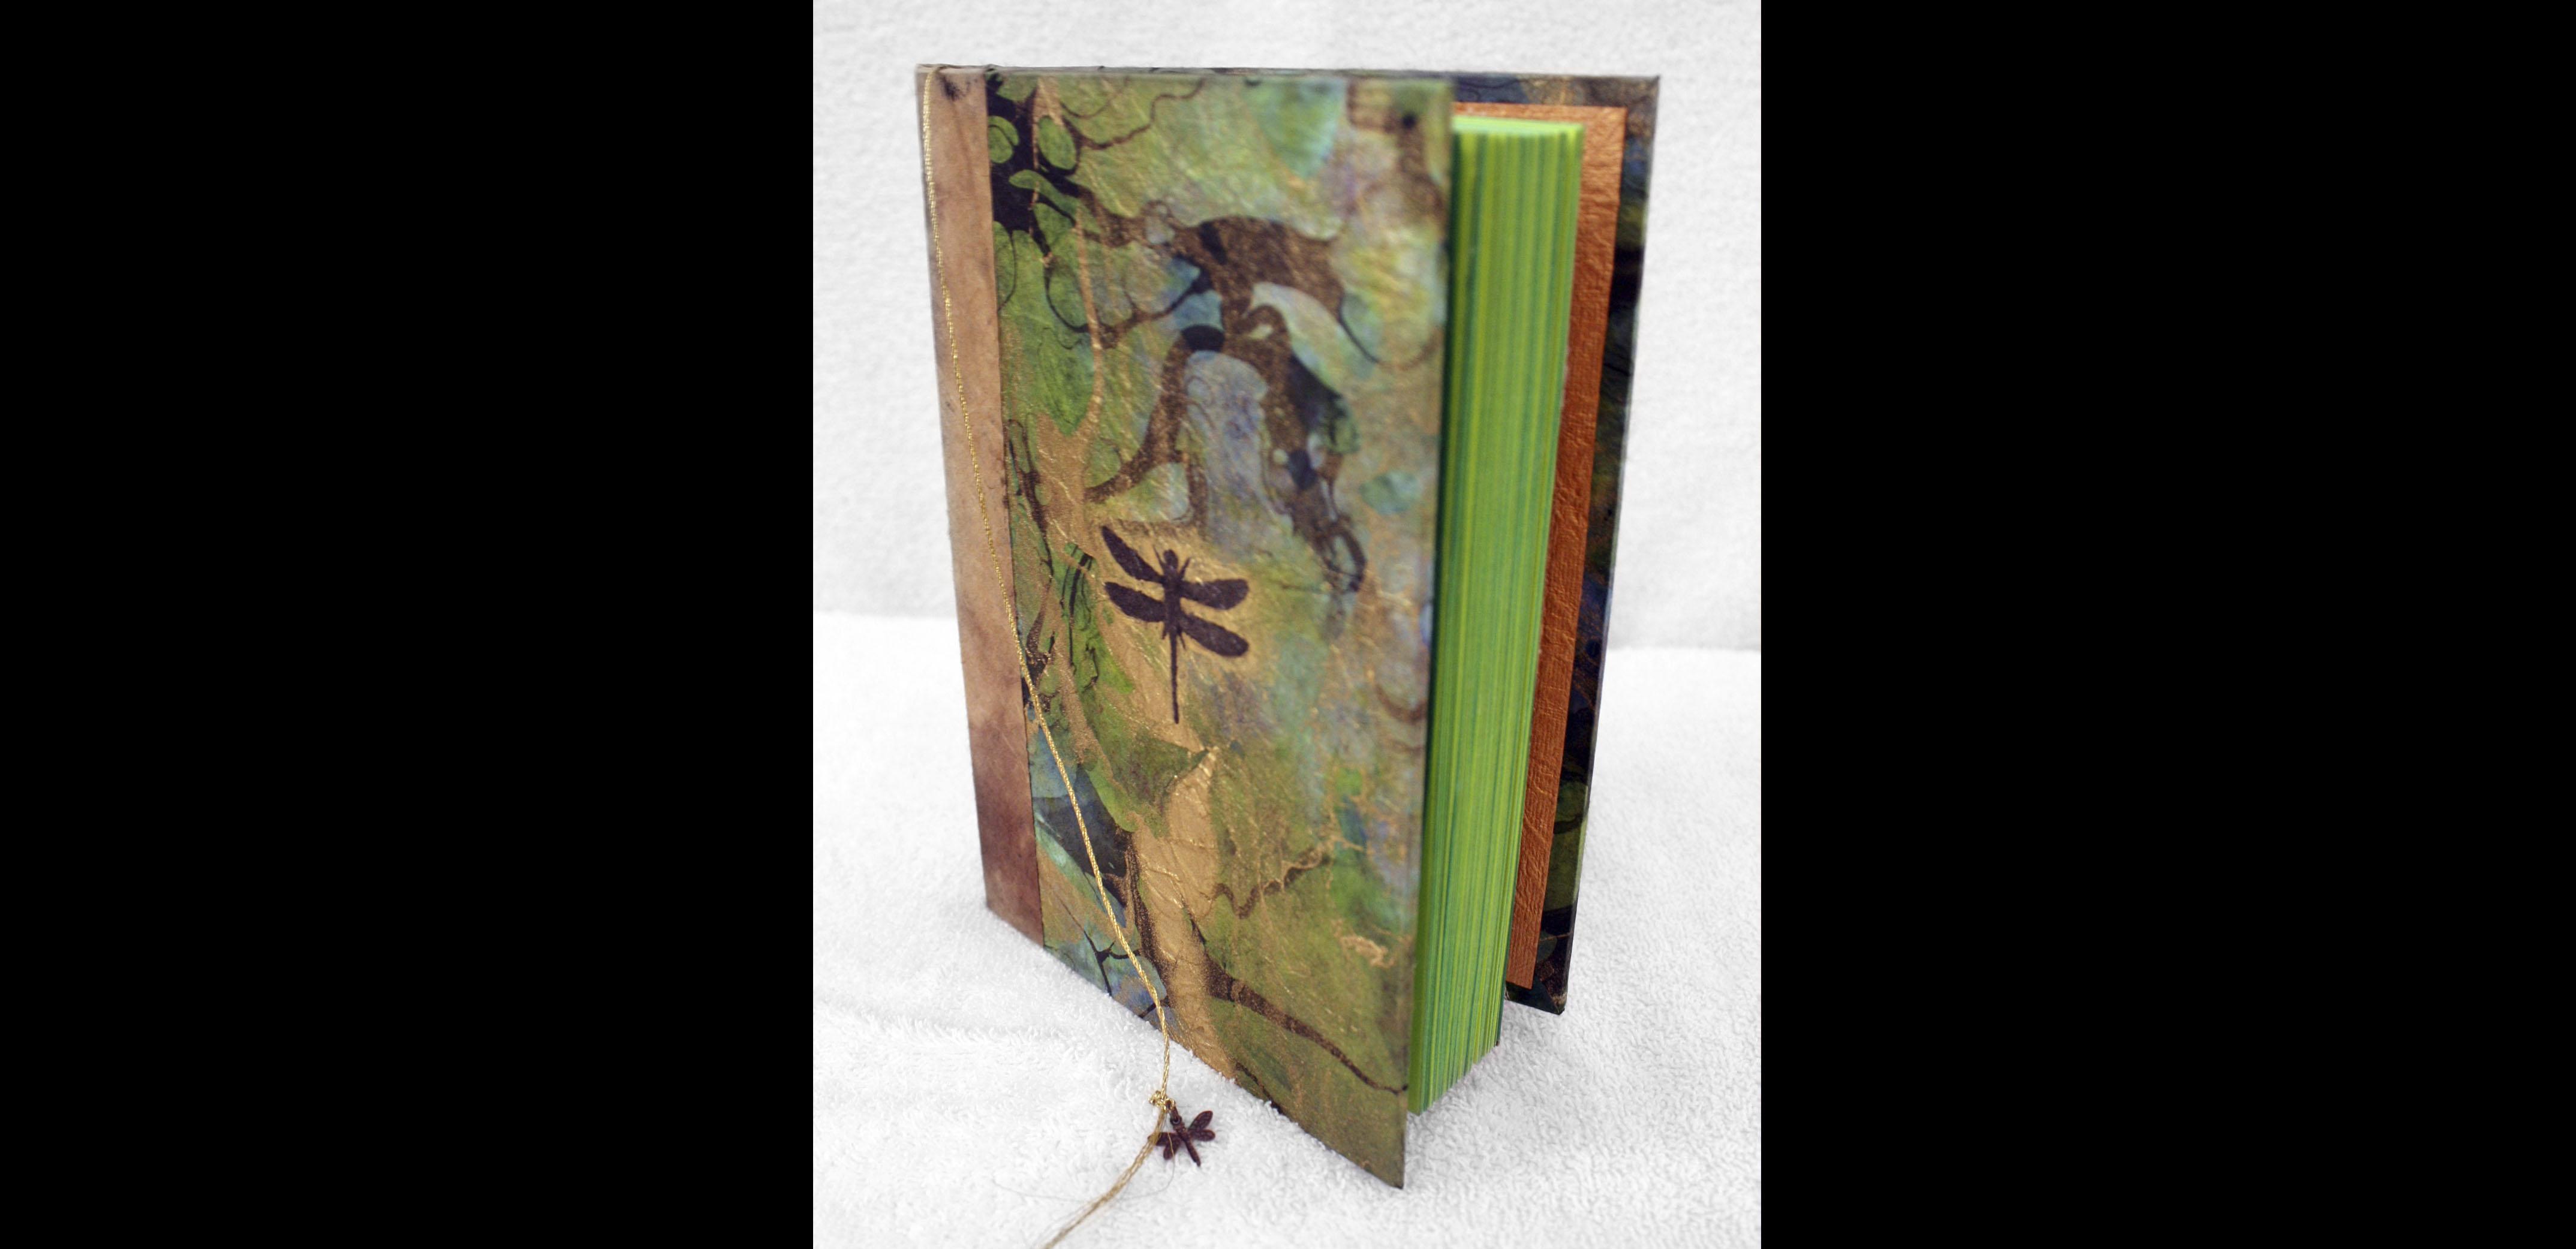 Vertical Green Dragonfly Book